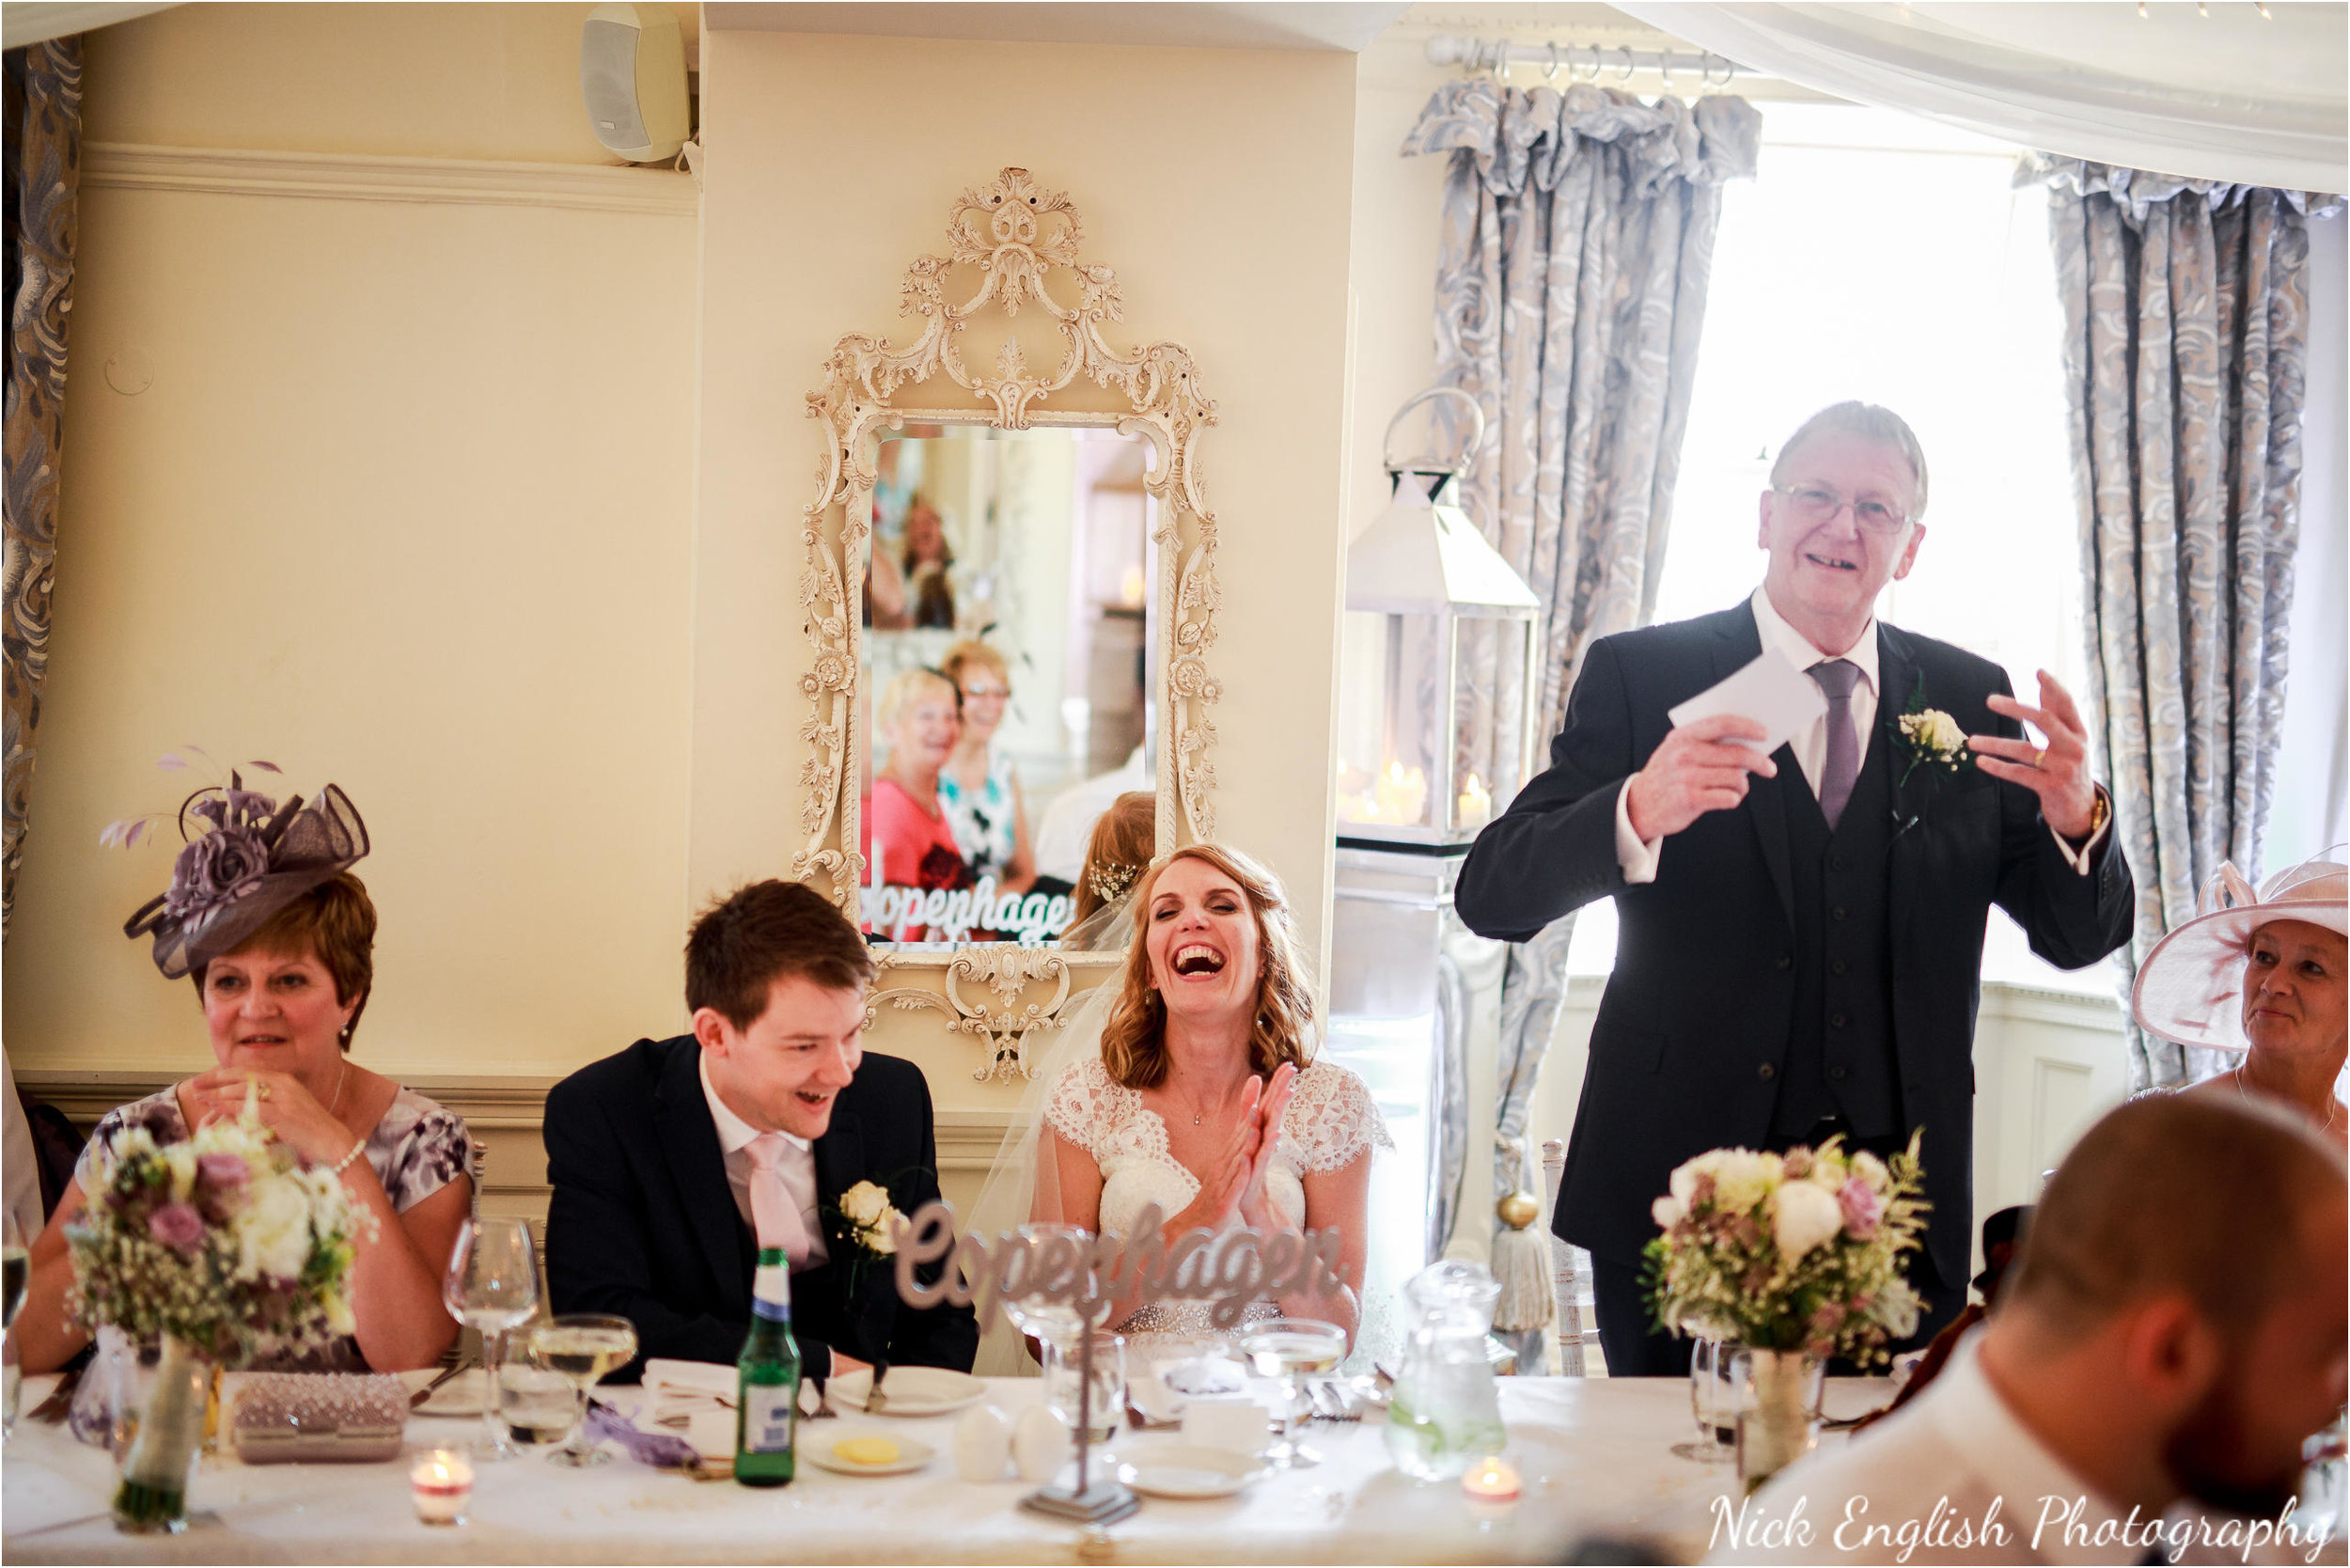 Alison James Wedding Photographs at Eaves Hall West Bradford 165jpg.jpeg